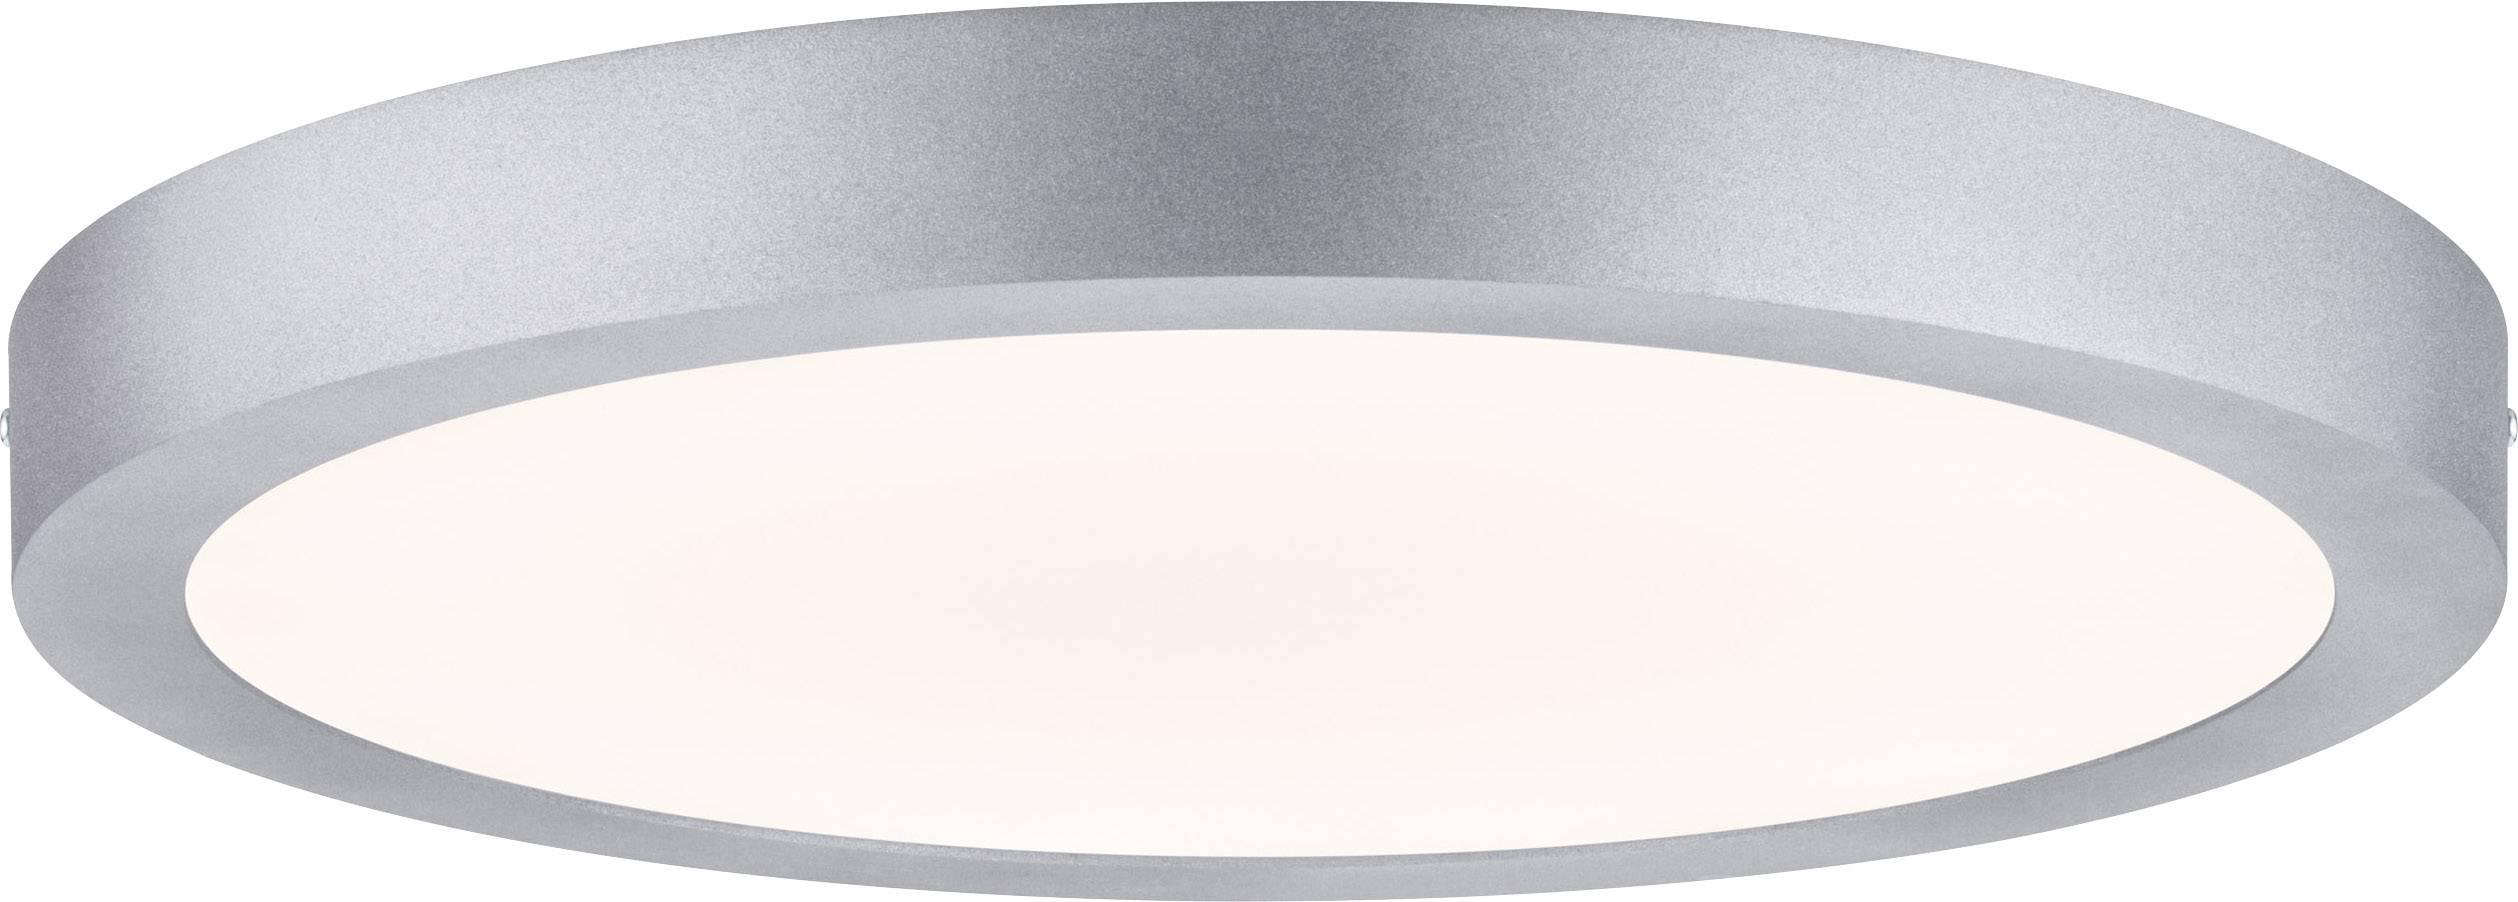 LED panel Paulmann Lunar 706.56, 22 W, teplá biela, chróm (matný)